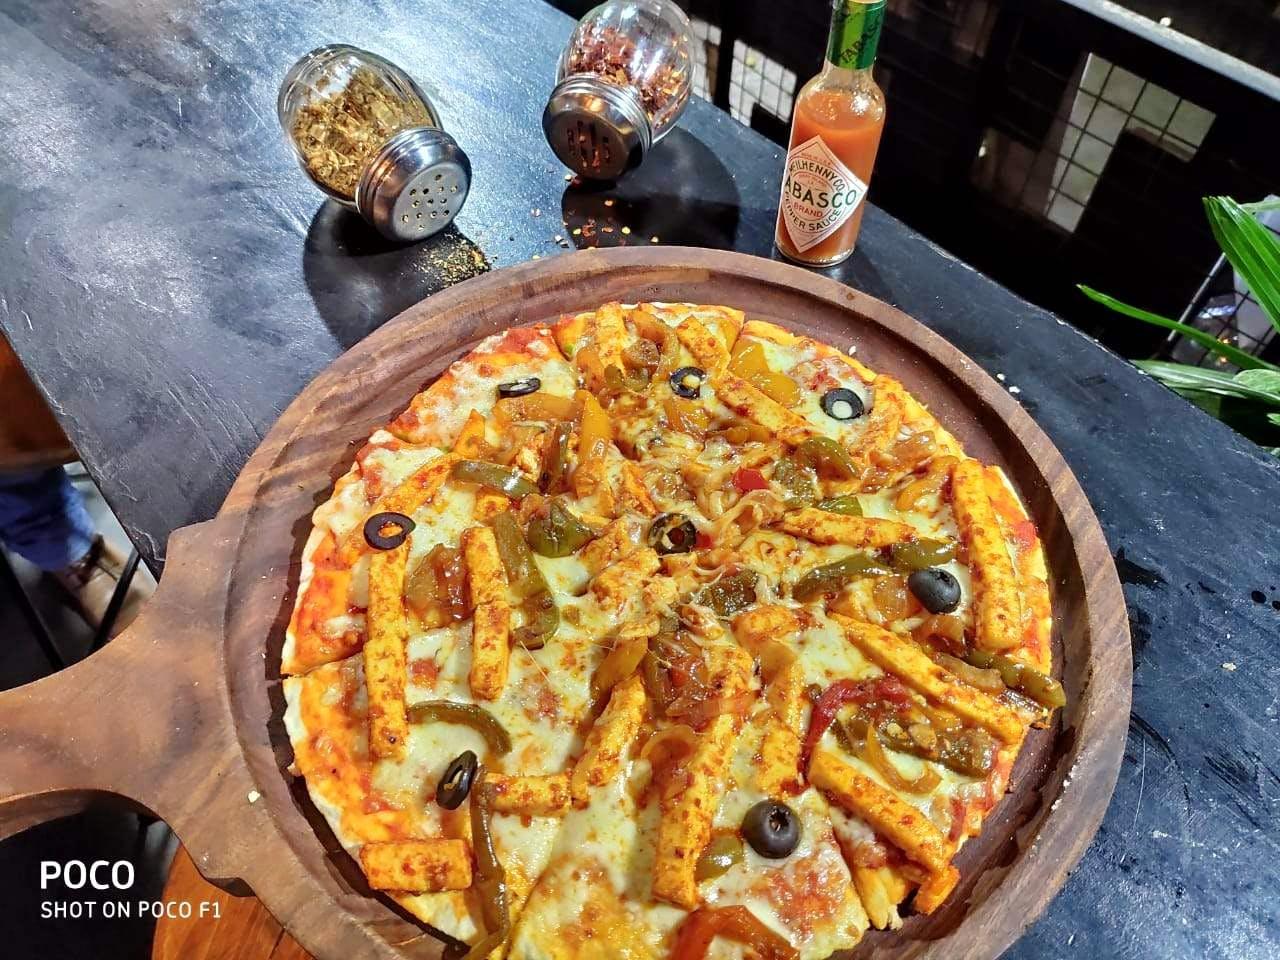 Dish,Food,Cuisine,Pizza,Pizza cheese,California-style pizza,Ingredient,Italian food,Pissaladière,Tarte flambée